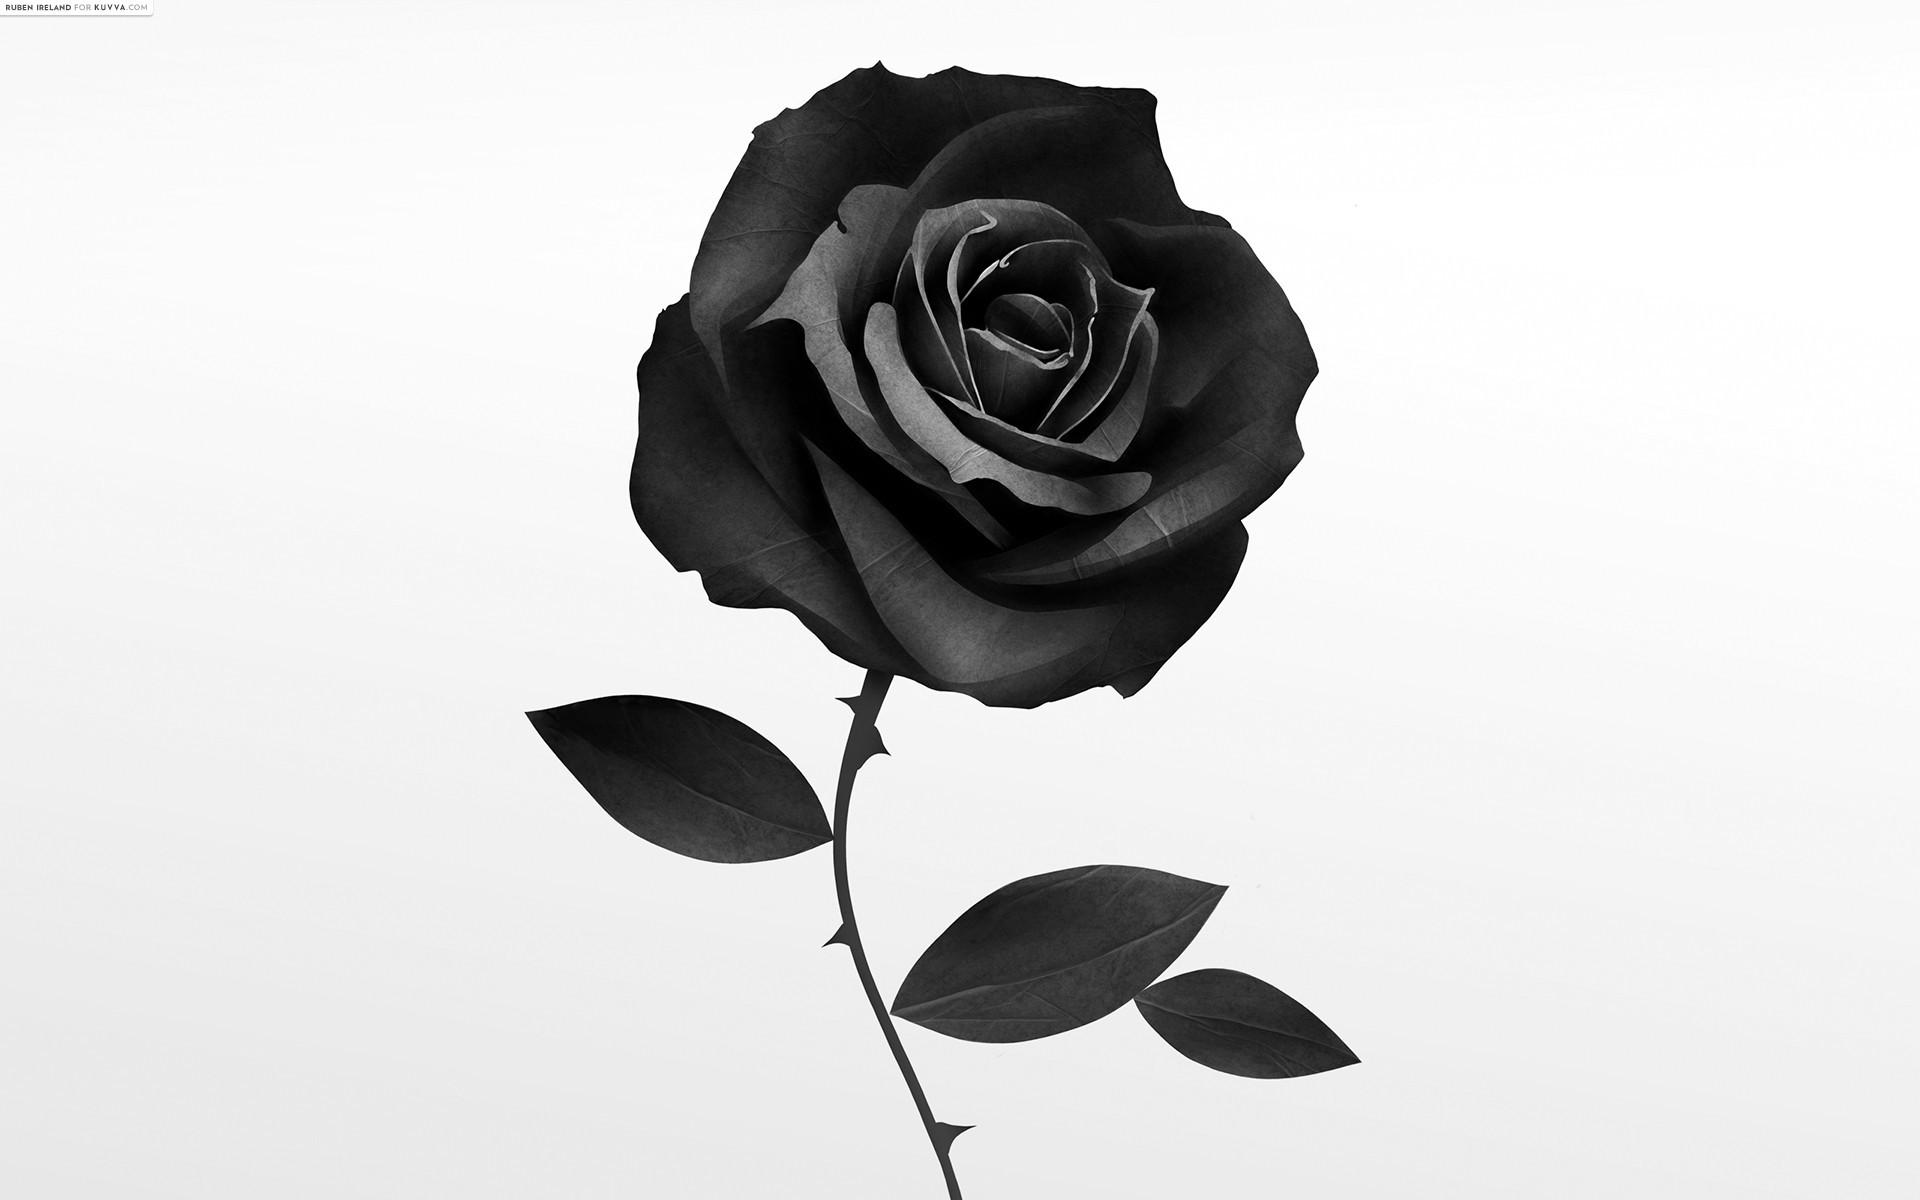 Single Black Rose Wallpaper